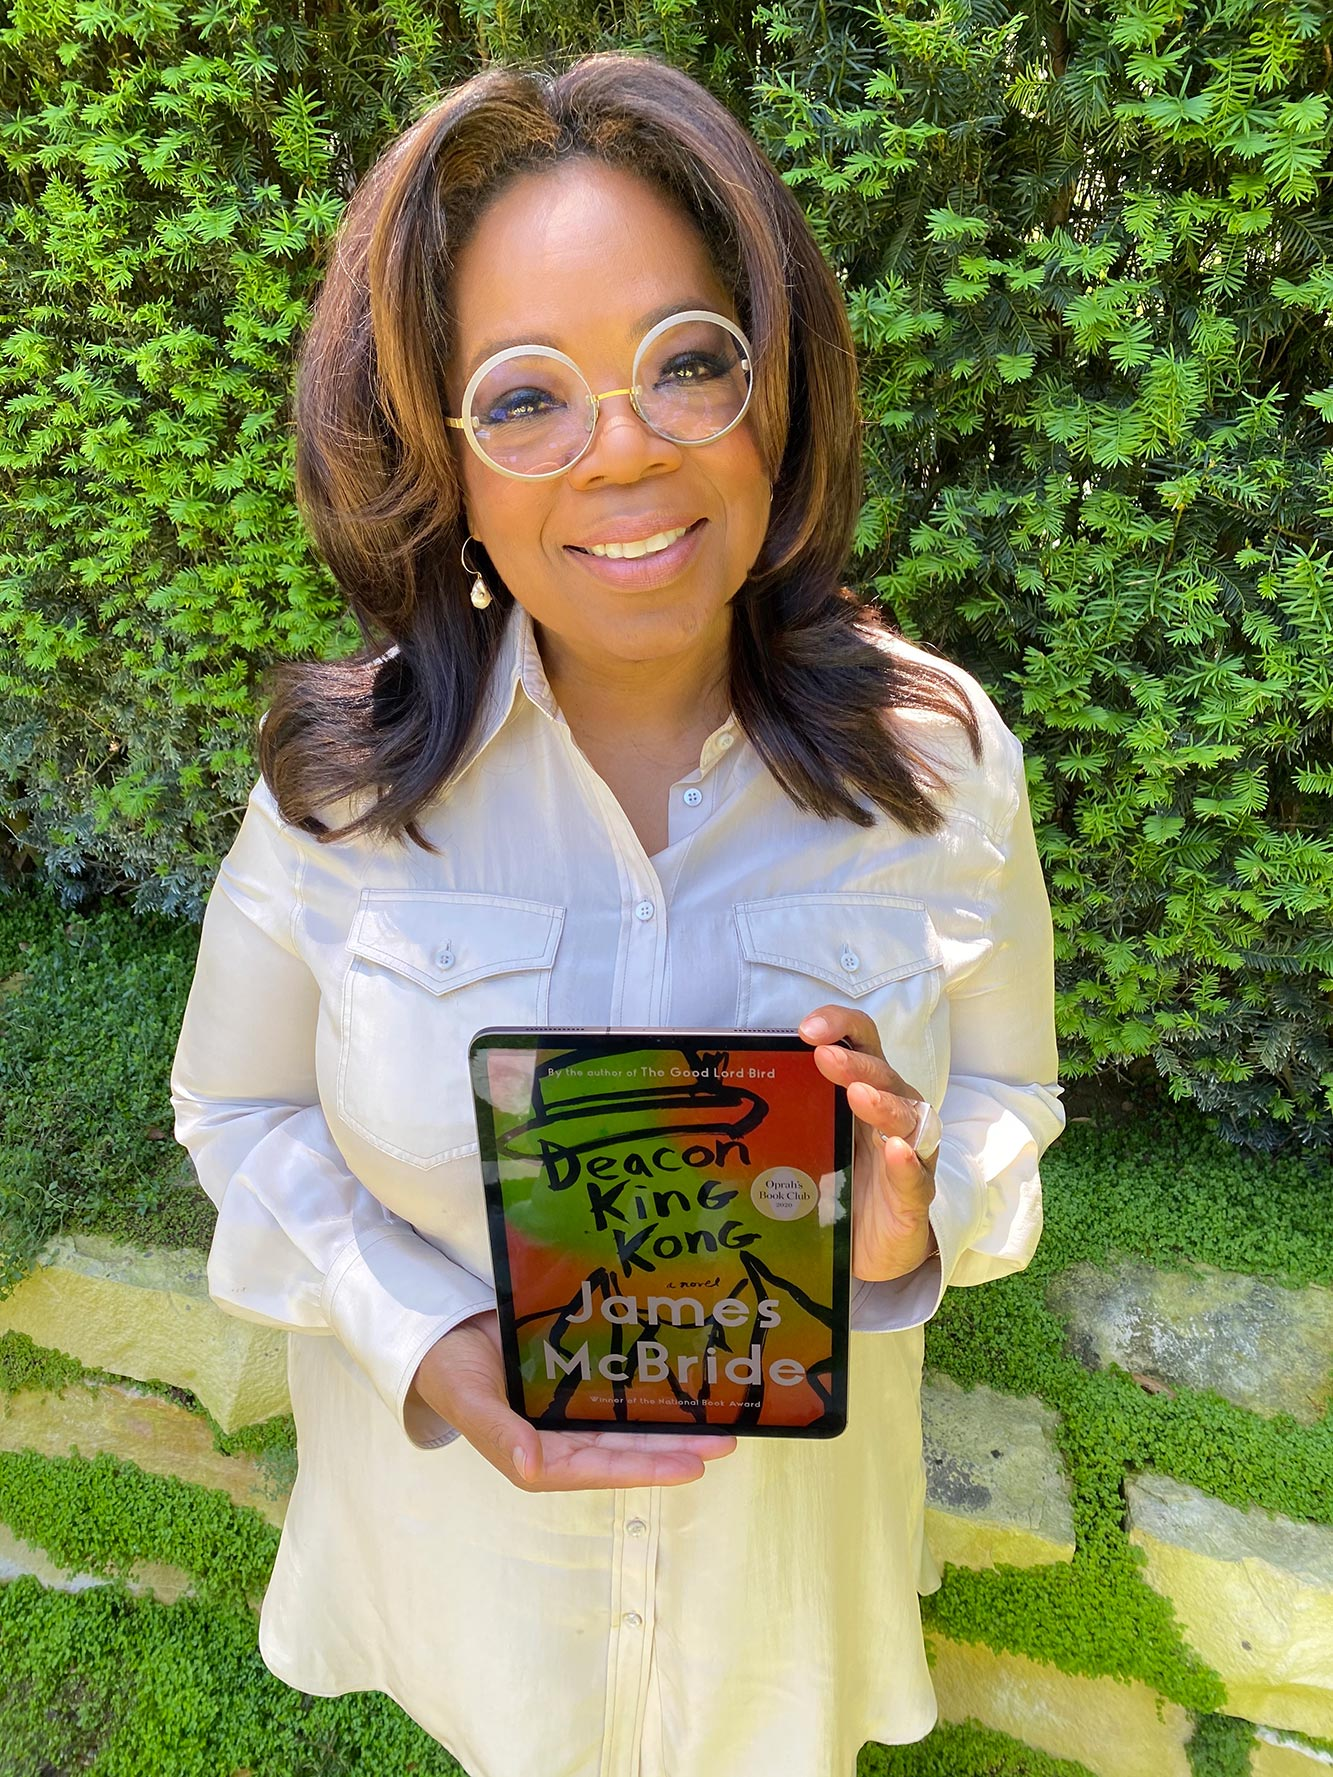 Oprah's Book Club pick 'Deacon King Kong' by James McBride